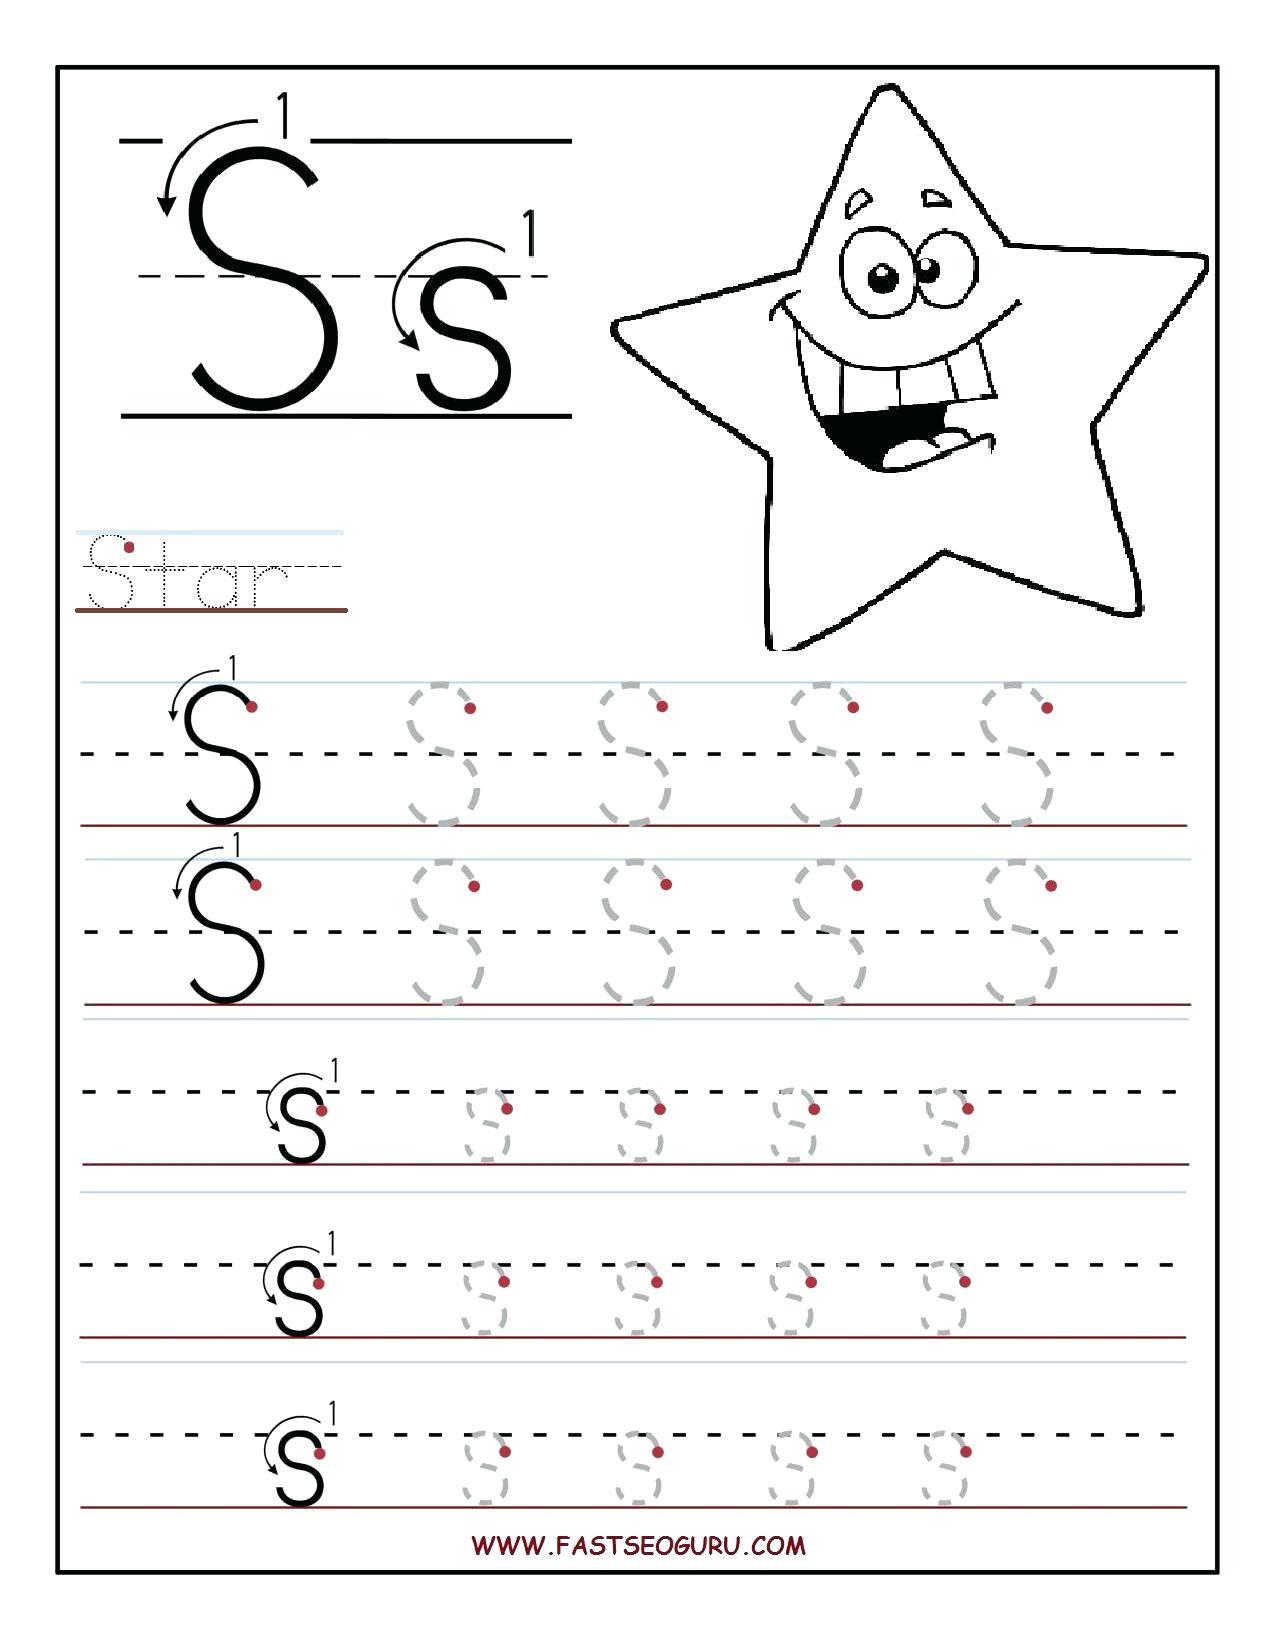 Preschool Name Worksheet Generator - Clover Hatunisi